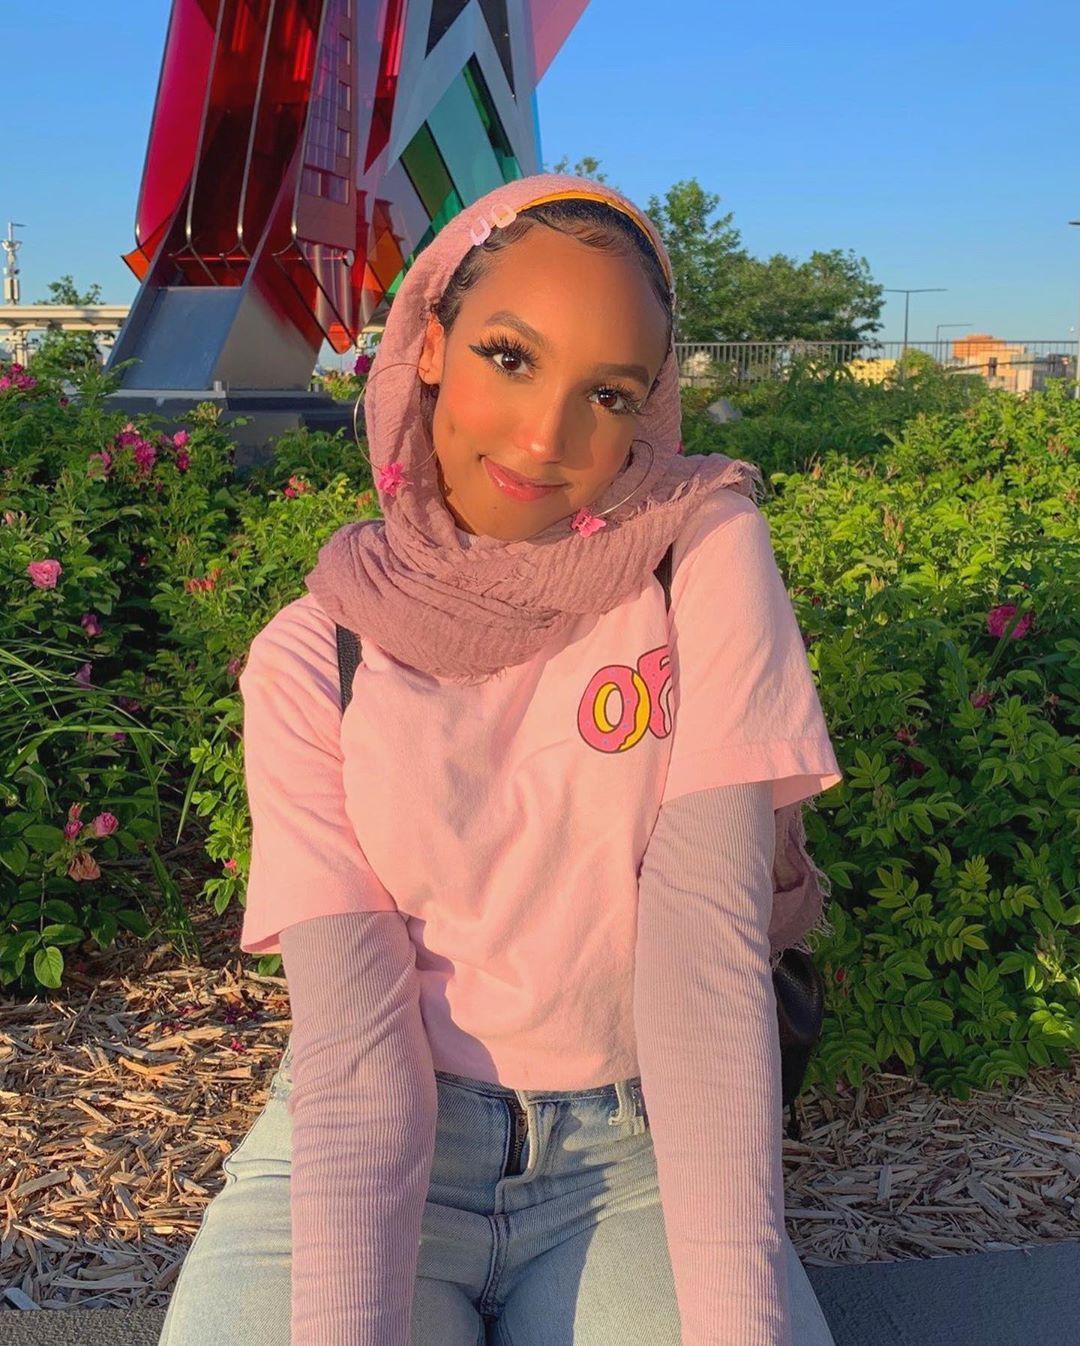 Zahra A Fardos Z Fardos على Tiktok Inspired By Muslim Girl Like And Follow Thisisquitting Leapday Got2bstyled Quickcuts Gaya Hijab Jilbab Sederhana